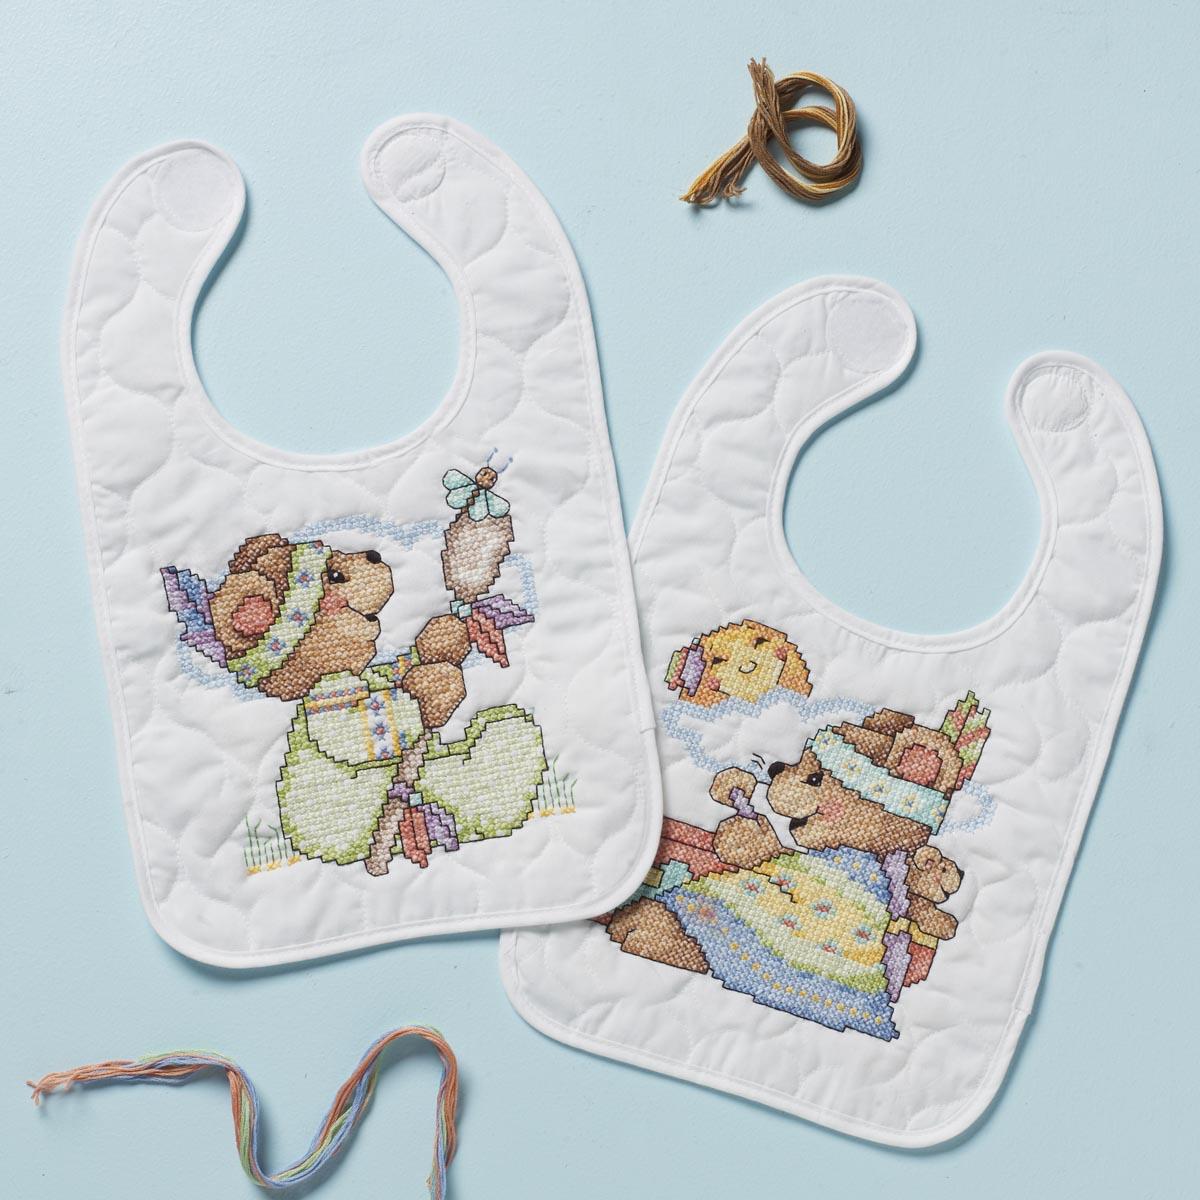 Bucilla ® Baby - Stamped Cross Stitch - Crib Ensembles - Tee Pee Bears Bib Pair Kit